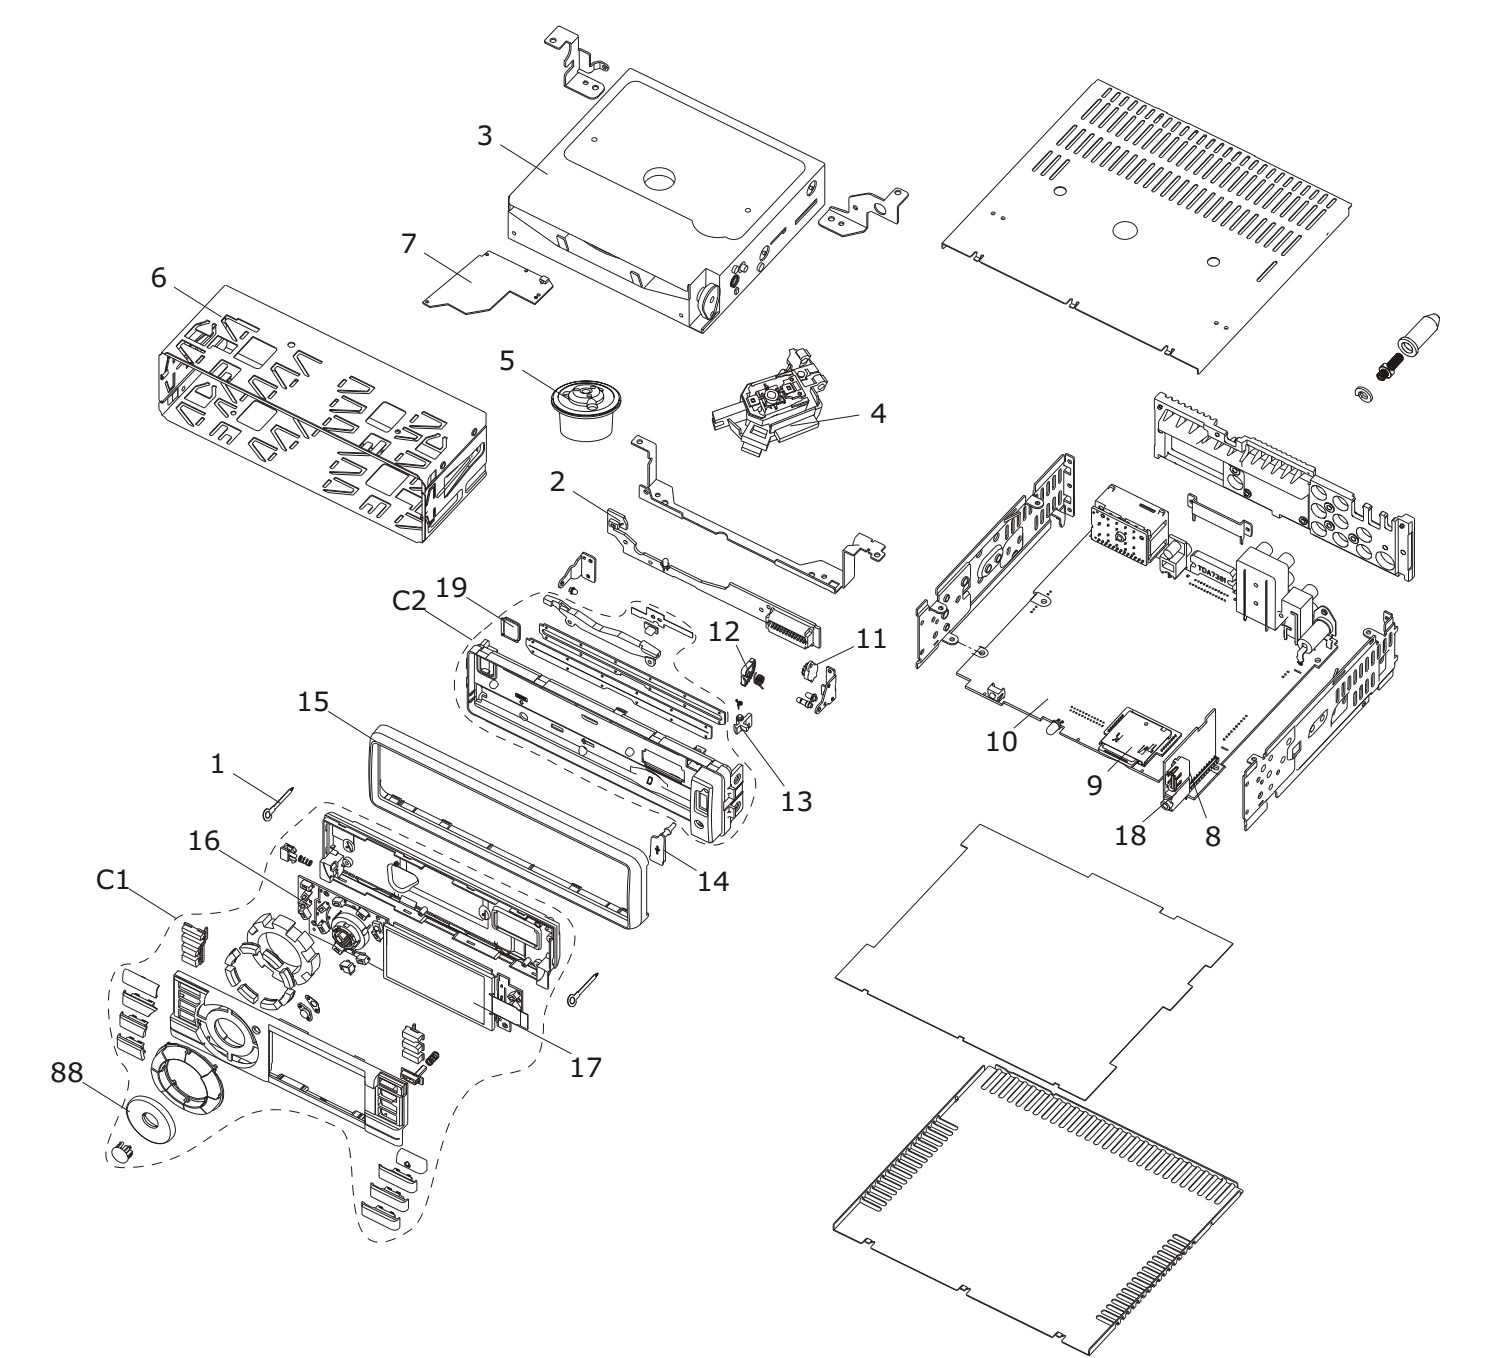 Philco Pca 530 Auto Radio Schematic Diagram Firmware